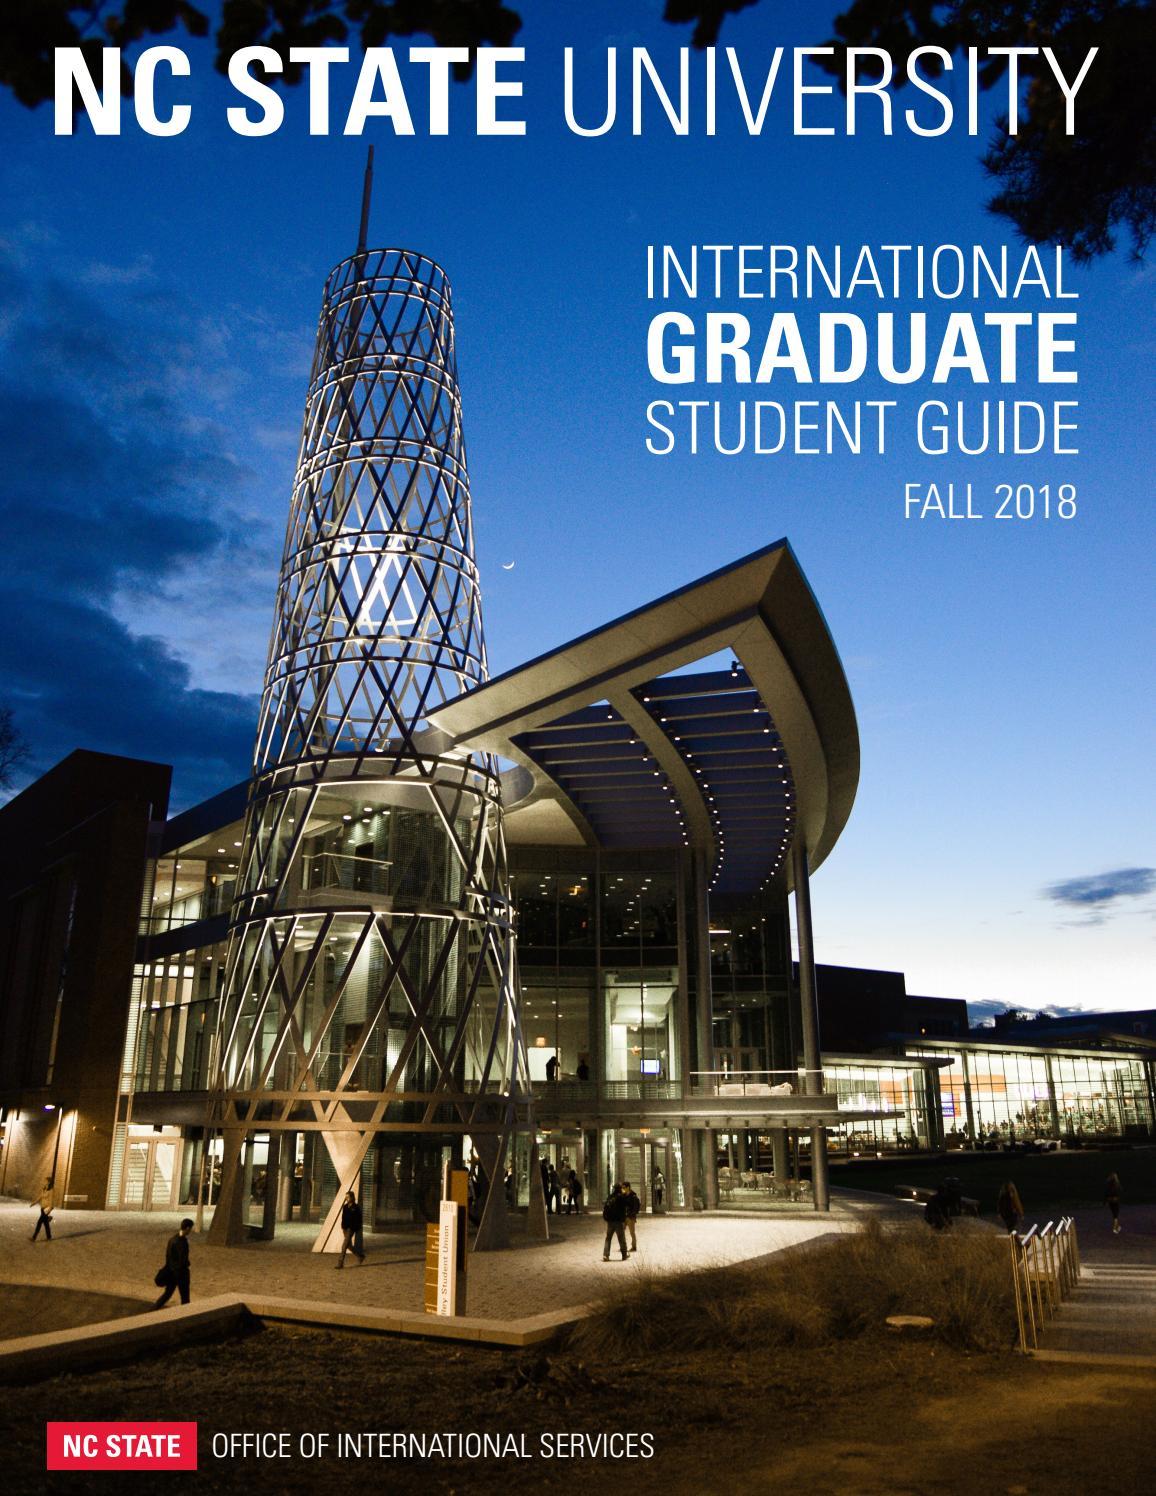 Ncsu Academic Calendar.Nc State Office Of International Services Fall 2018 International